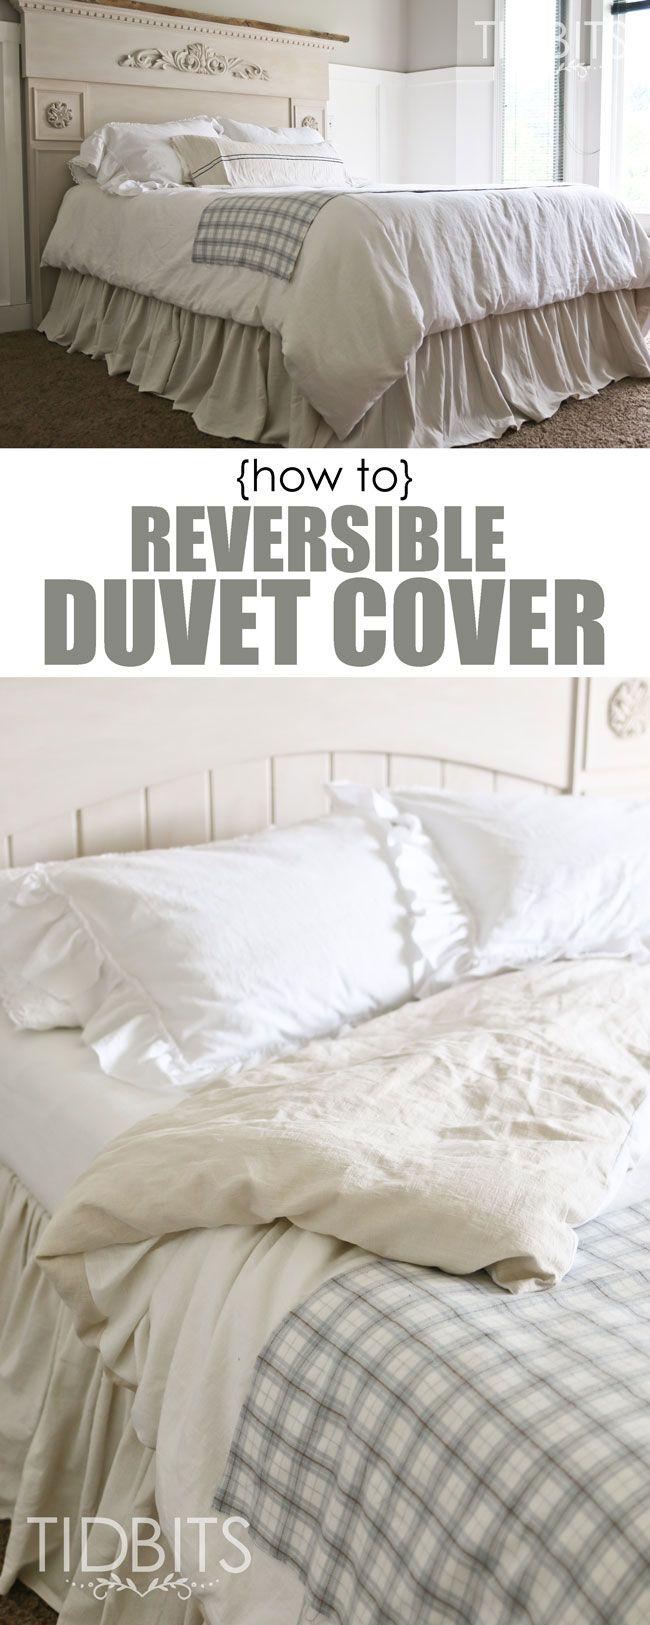 How to Make a Reversible Duvet Cover - Tidbits